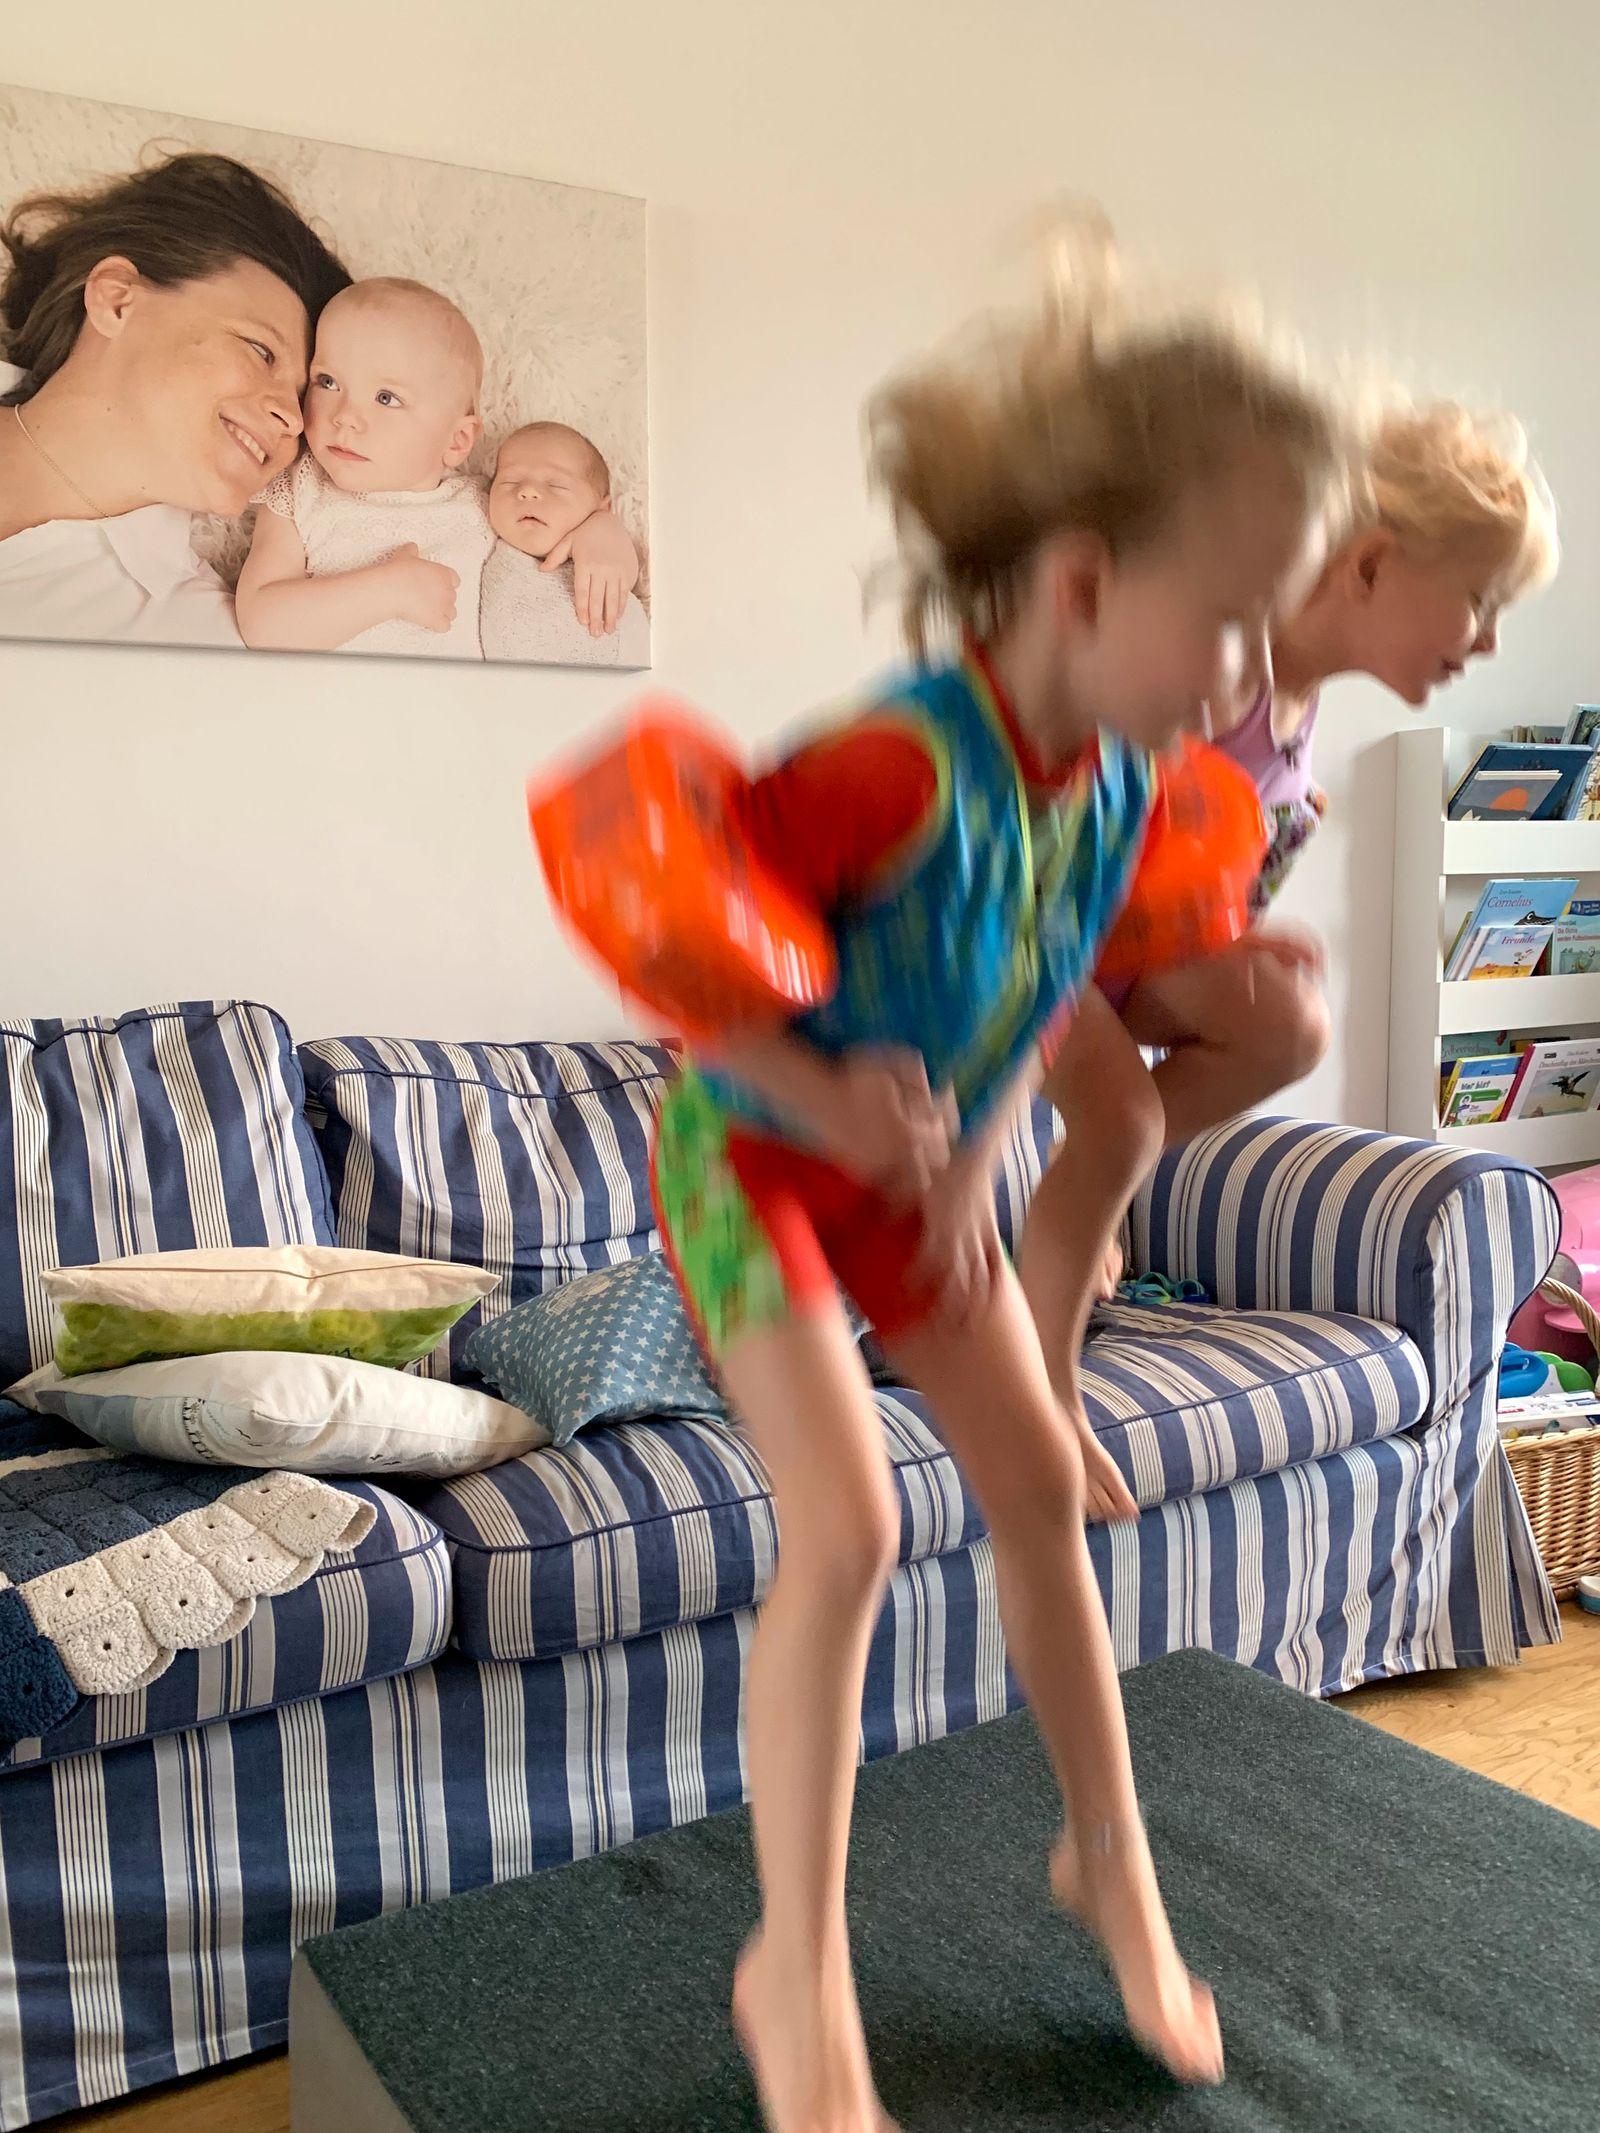 Kinder losgelöst/ Andrea Hensel